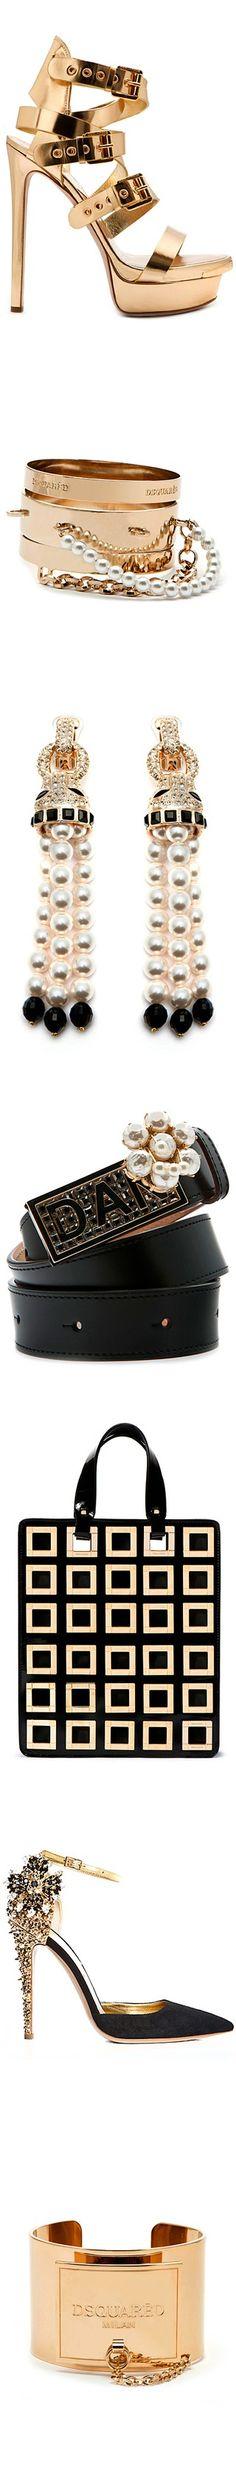 ✦ The Socialite's Shoes  {a peak into Ms. Socialite's shoe closet. Please don't drool} ✦  Dsquared2